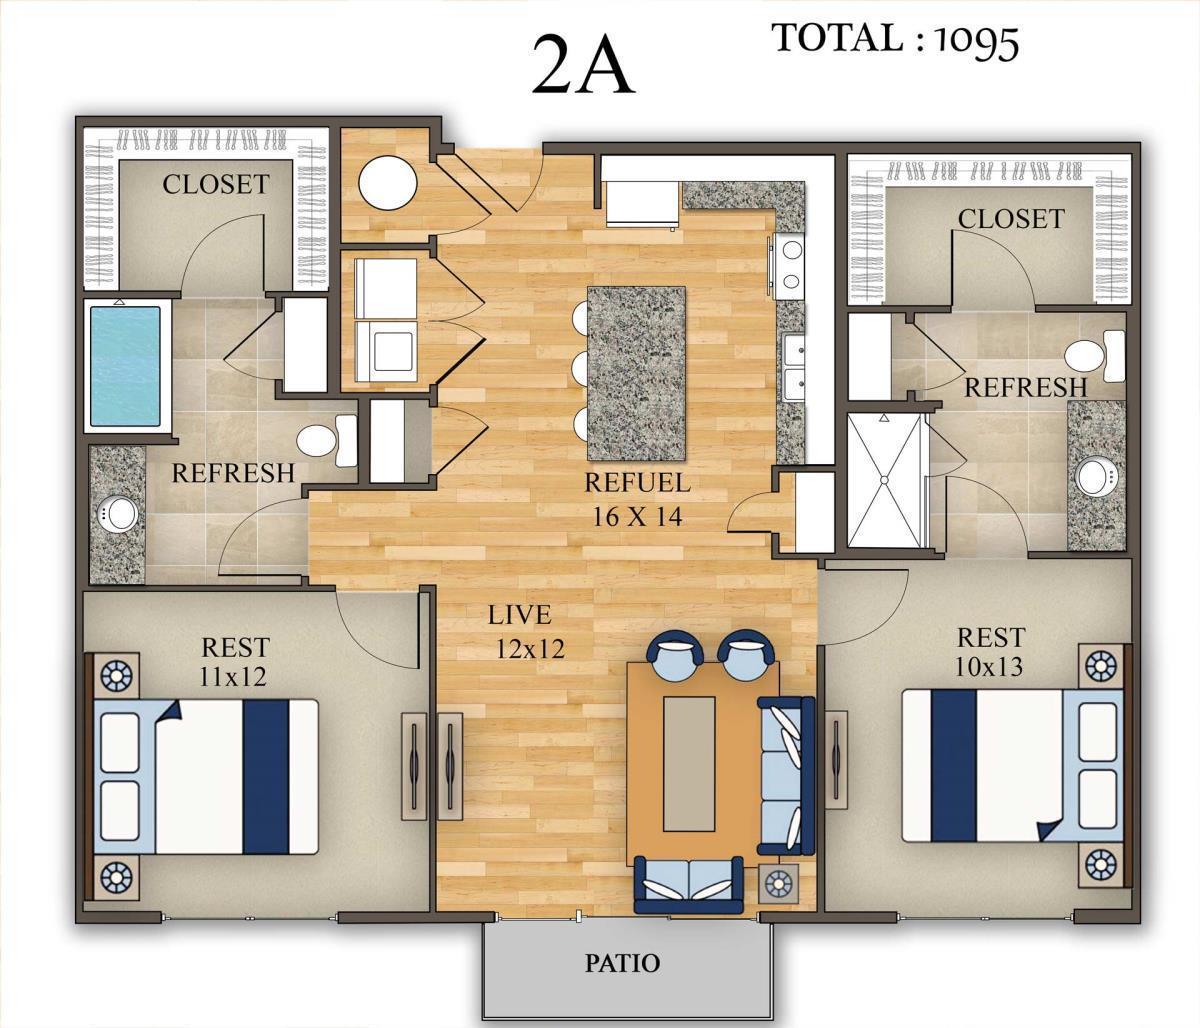 1,095 sq. ft. 2A floor plan